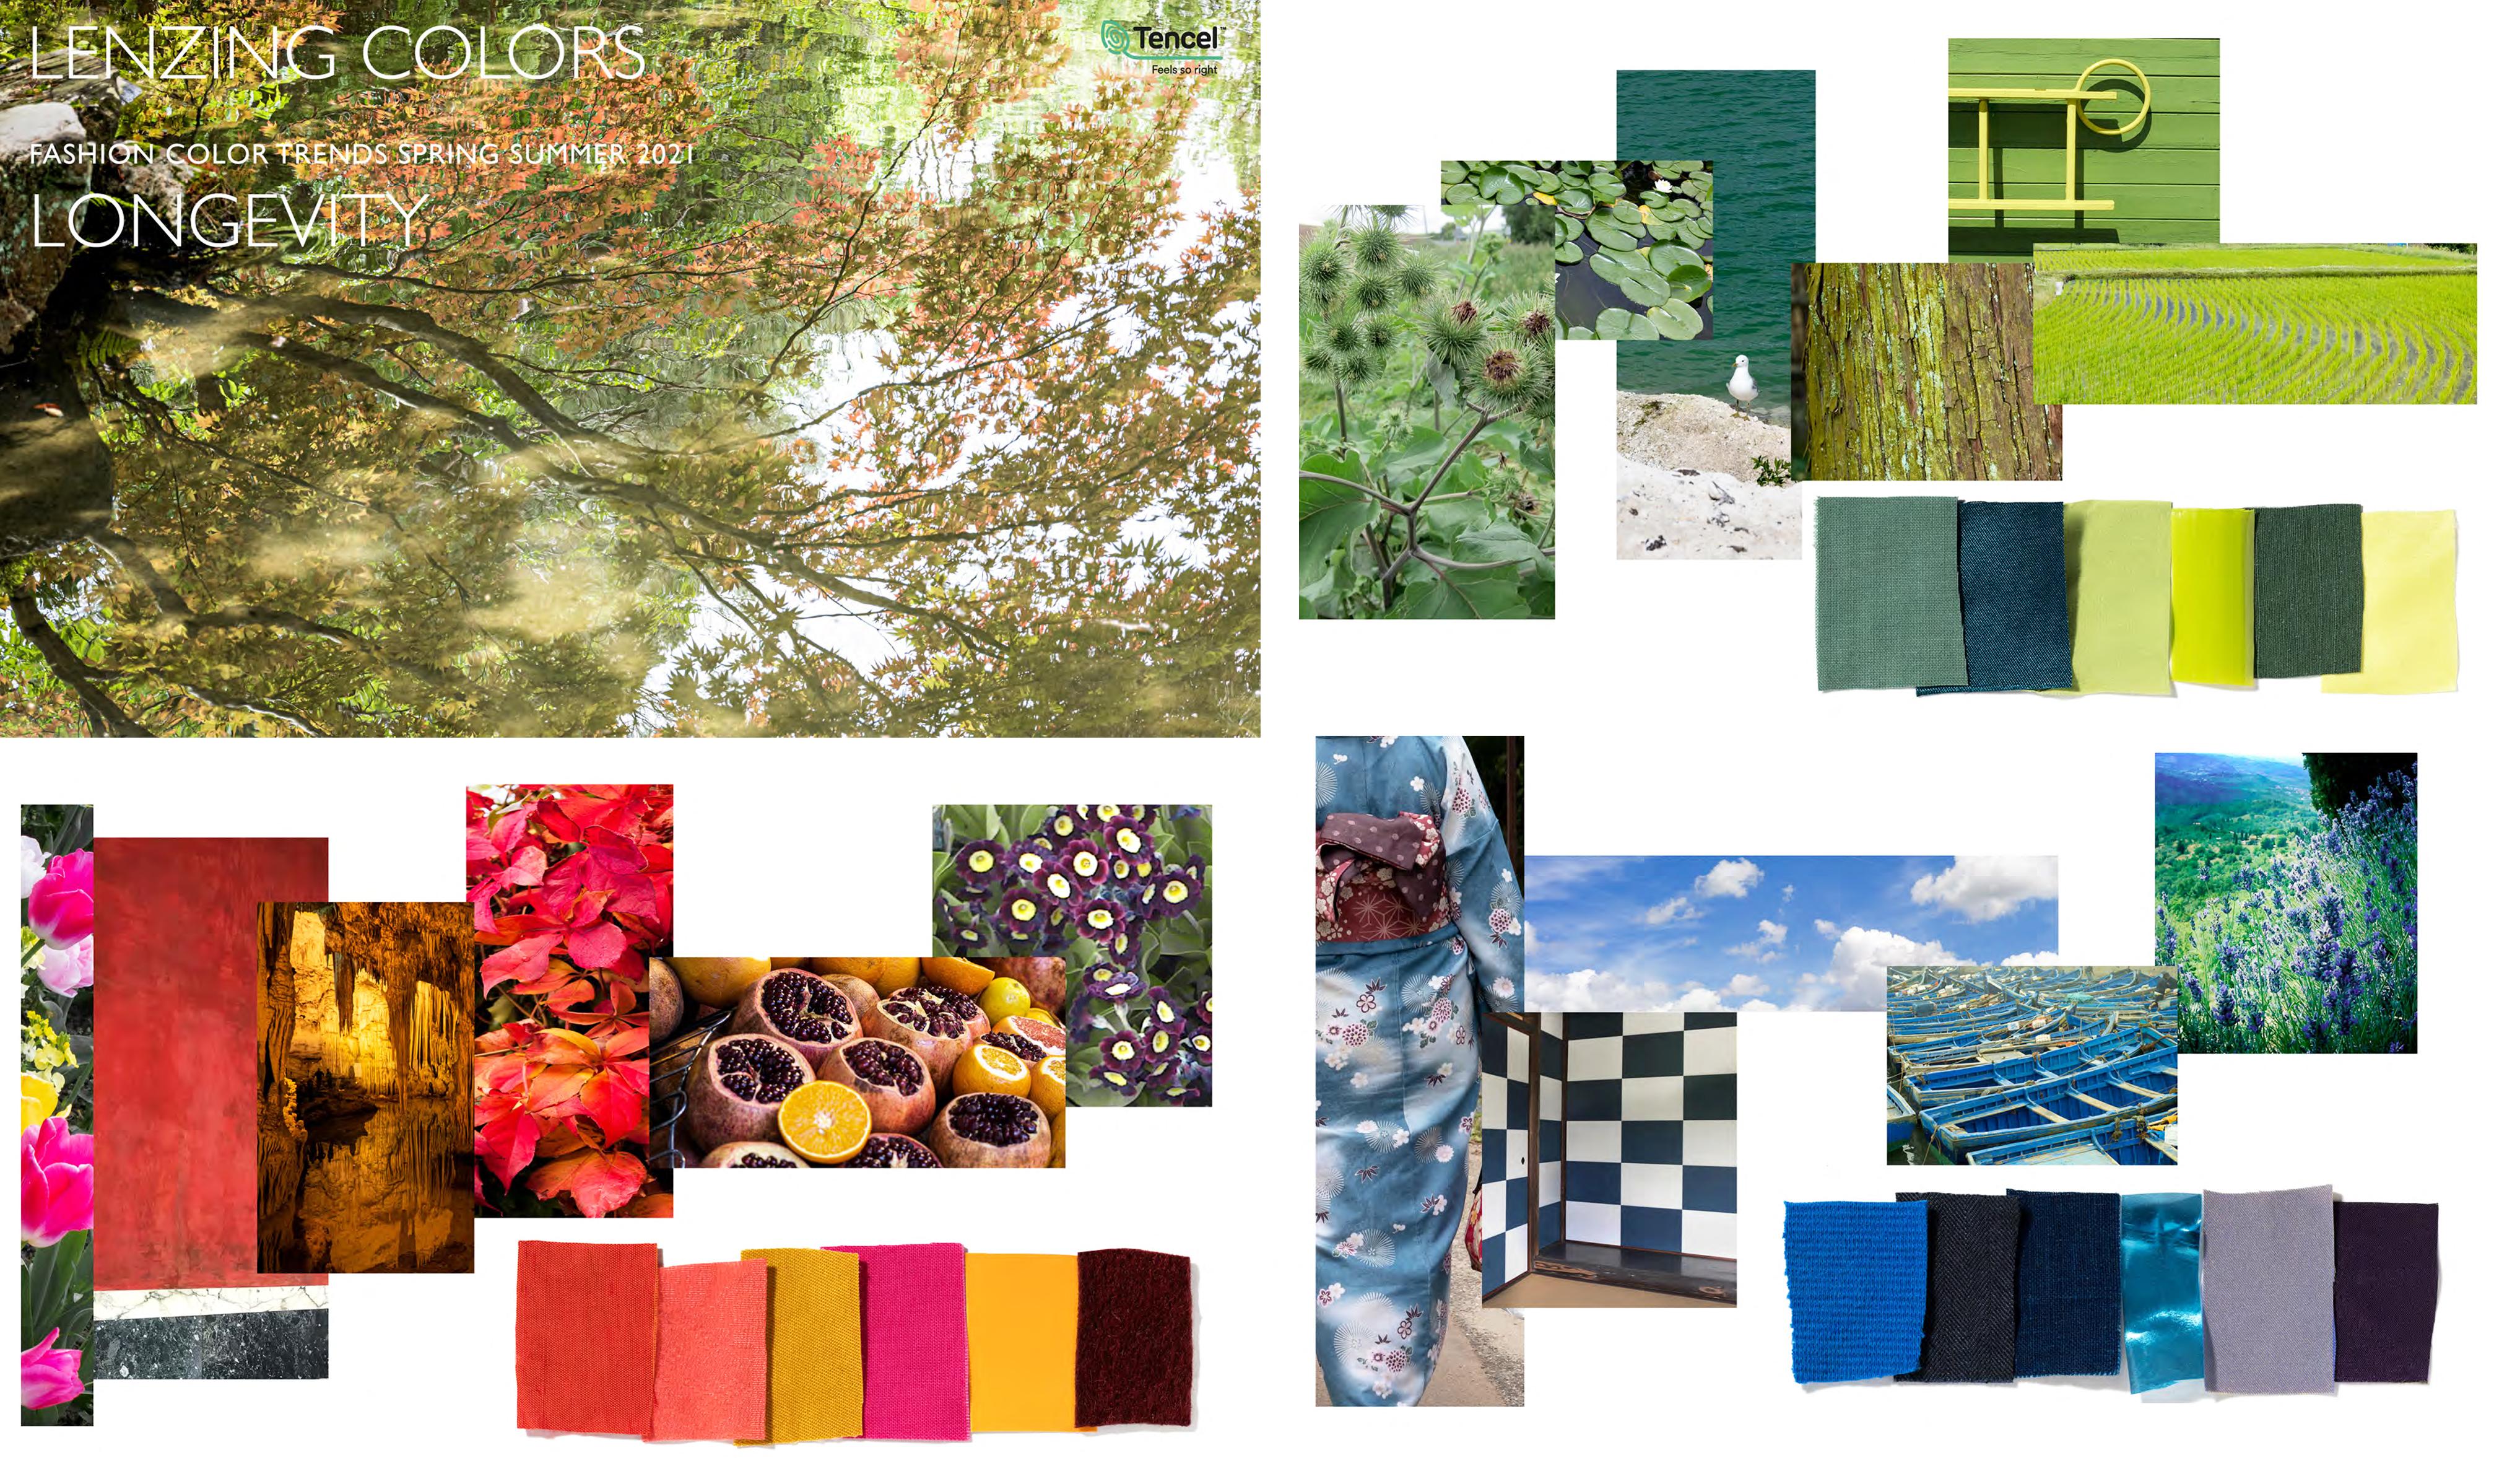 Lenzing Color Trends Spring/Summer 4 - Fashion Trendsetter